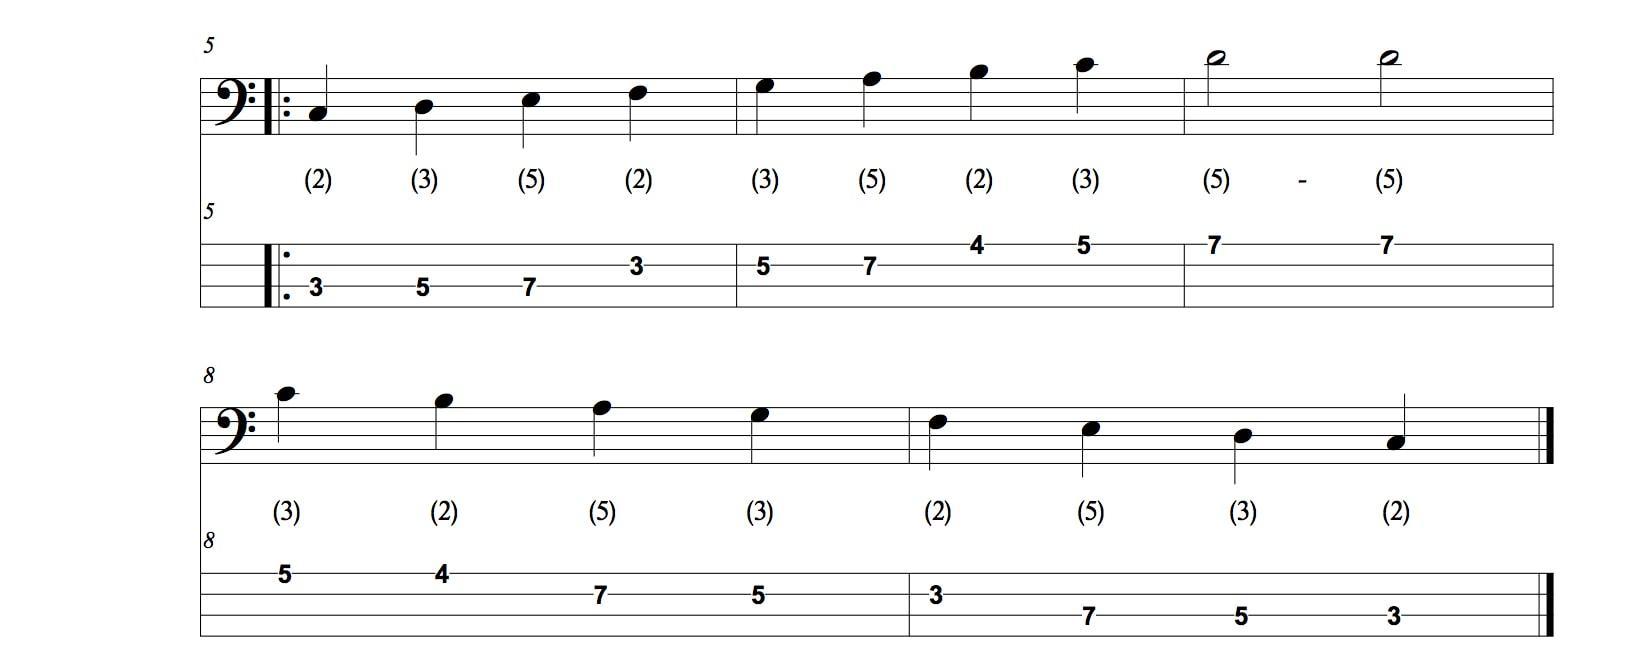 Doigtes gamme majeure guitare basse corde La_2